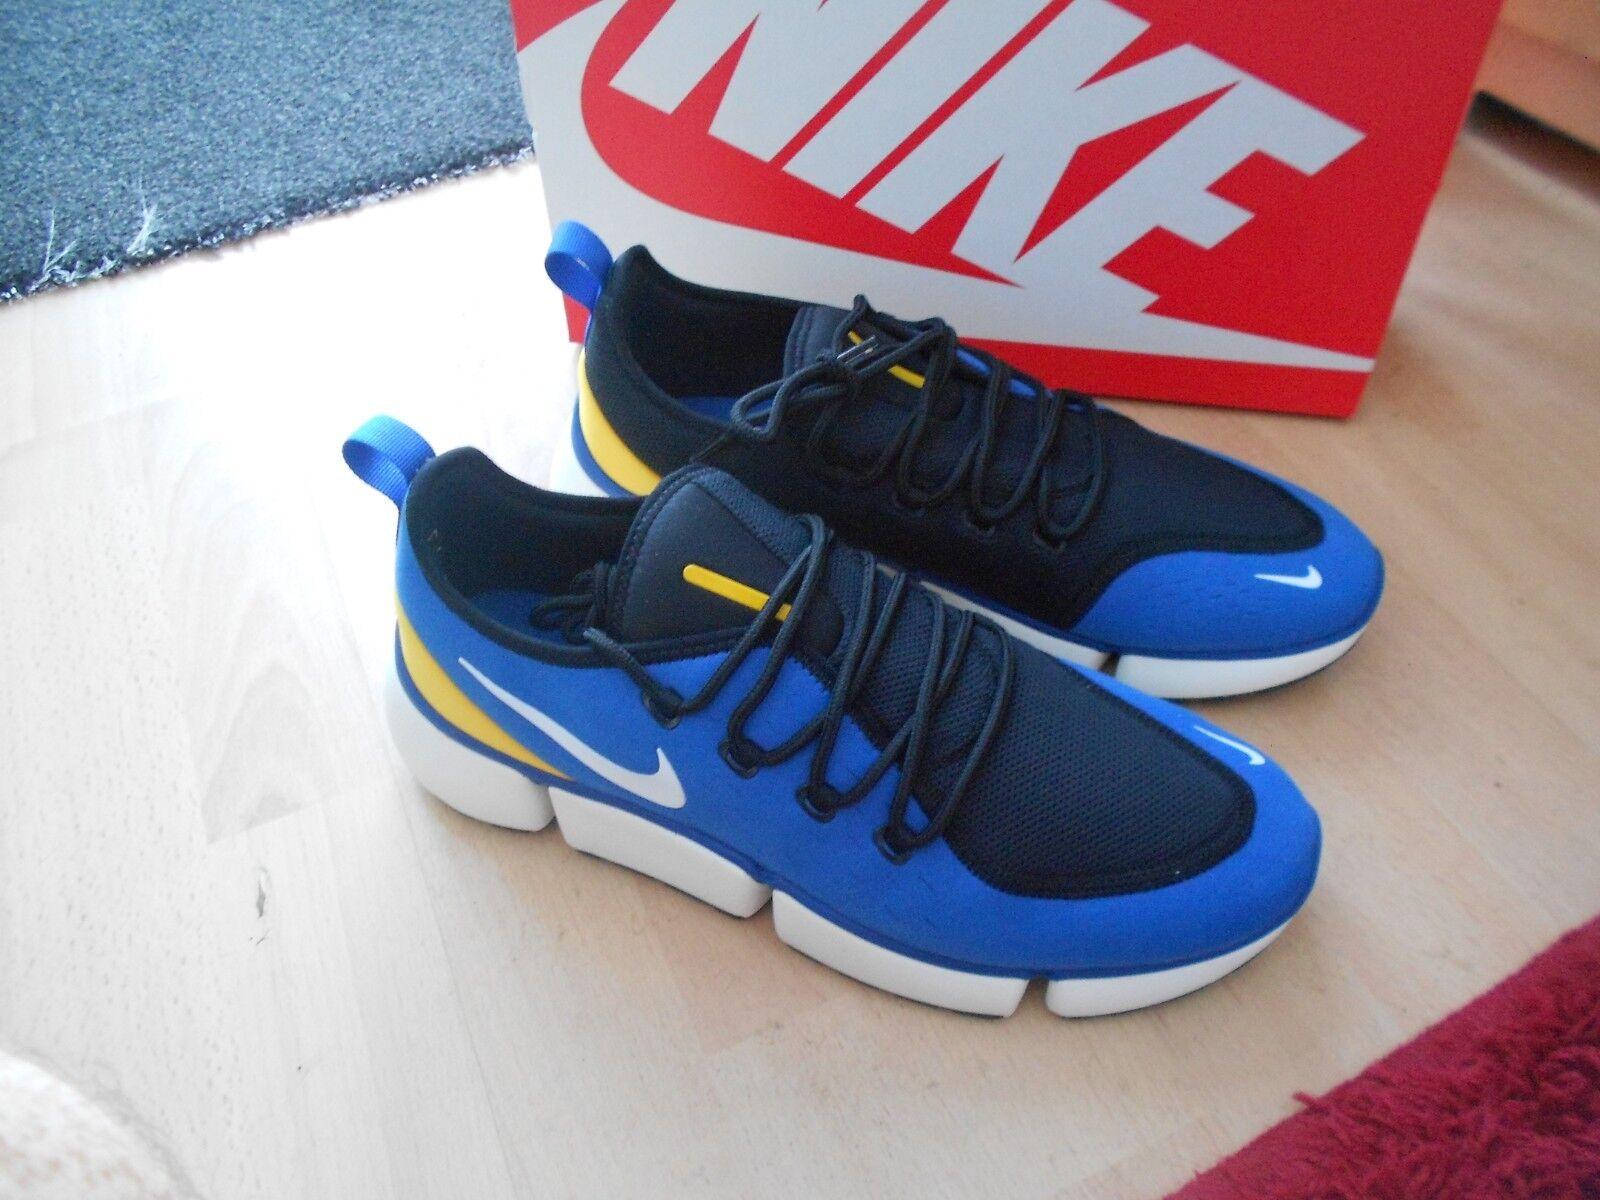 BNWB  Nike Bolsillo Volar dm Talla 10-Azul, blancoo, Negro, de Color amarillo  buen precio